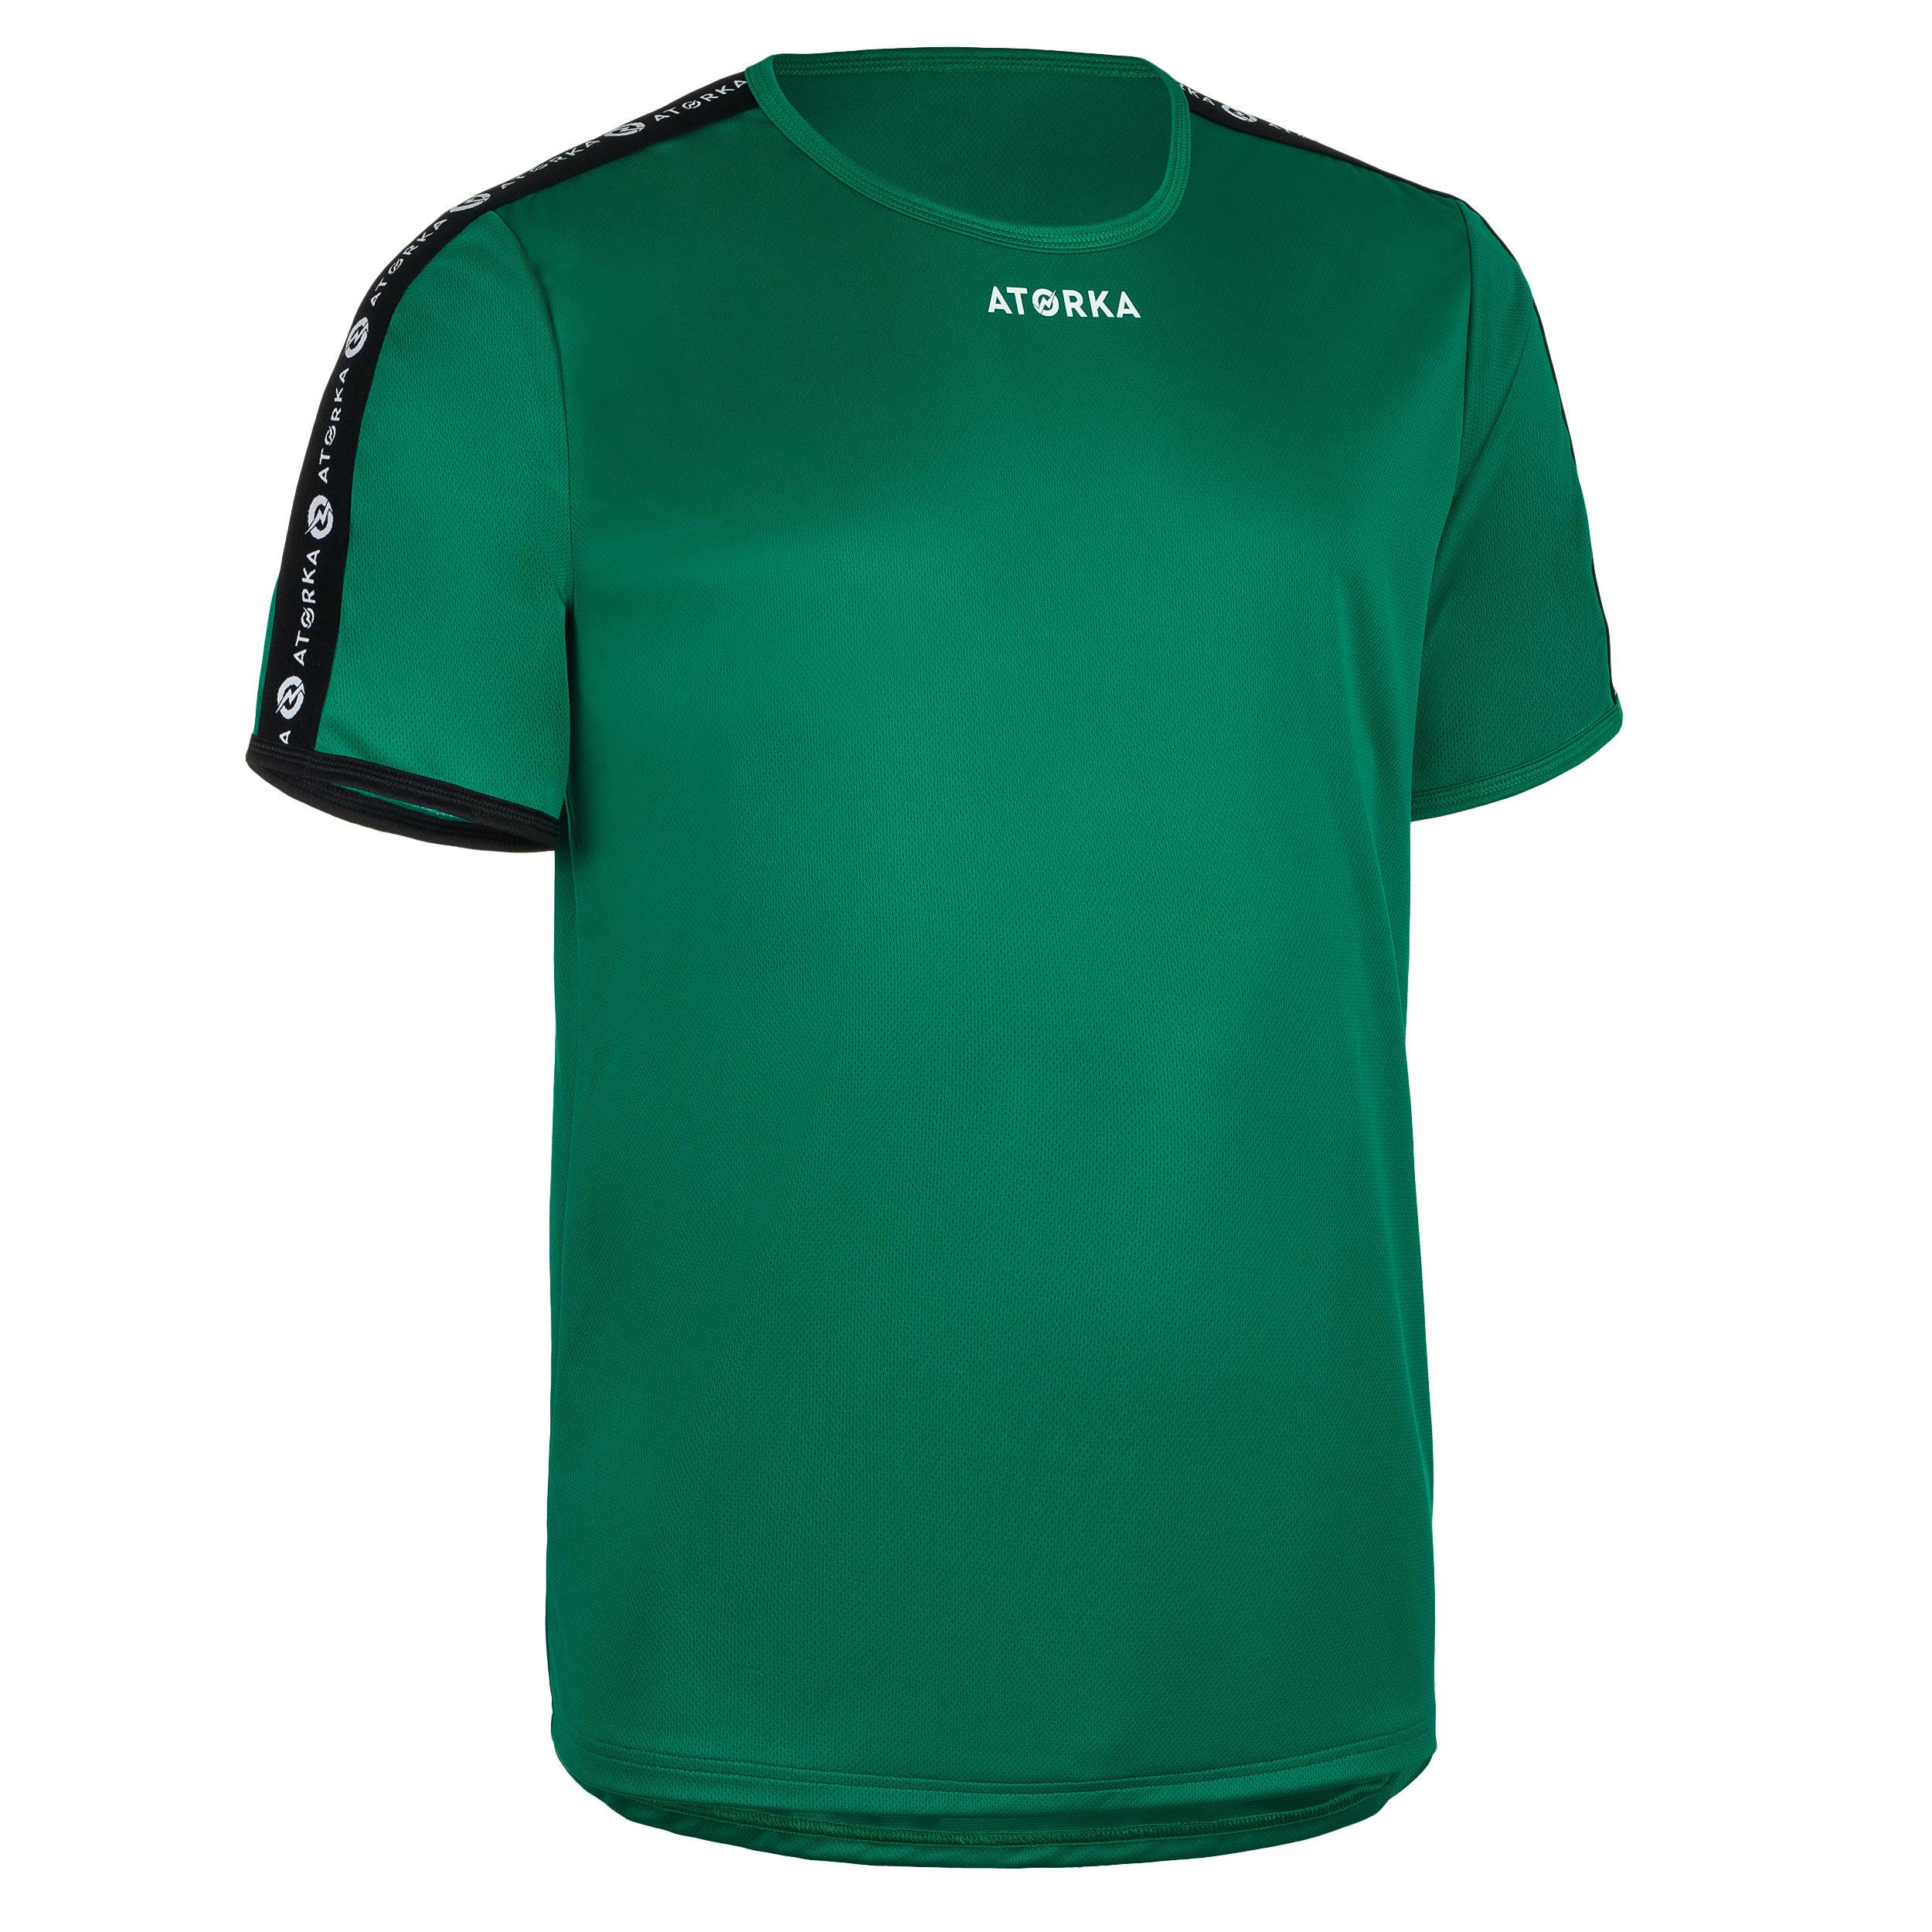 Tricou H100C verde bărbați la Reducere poza